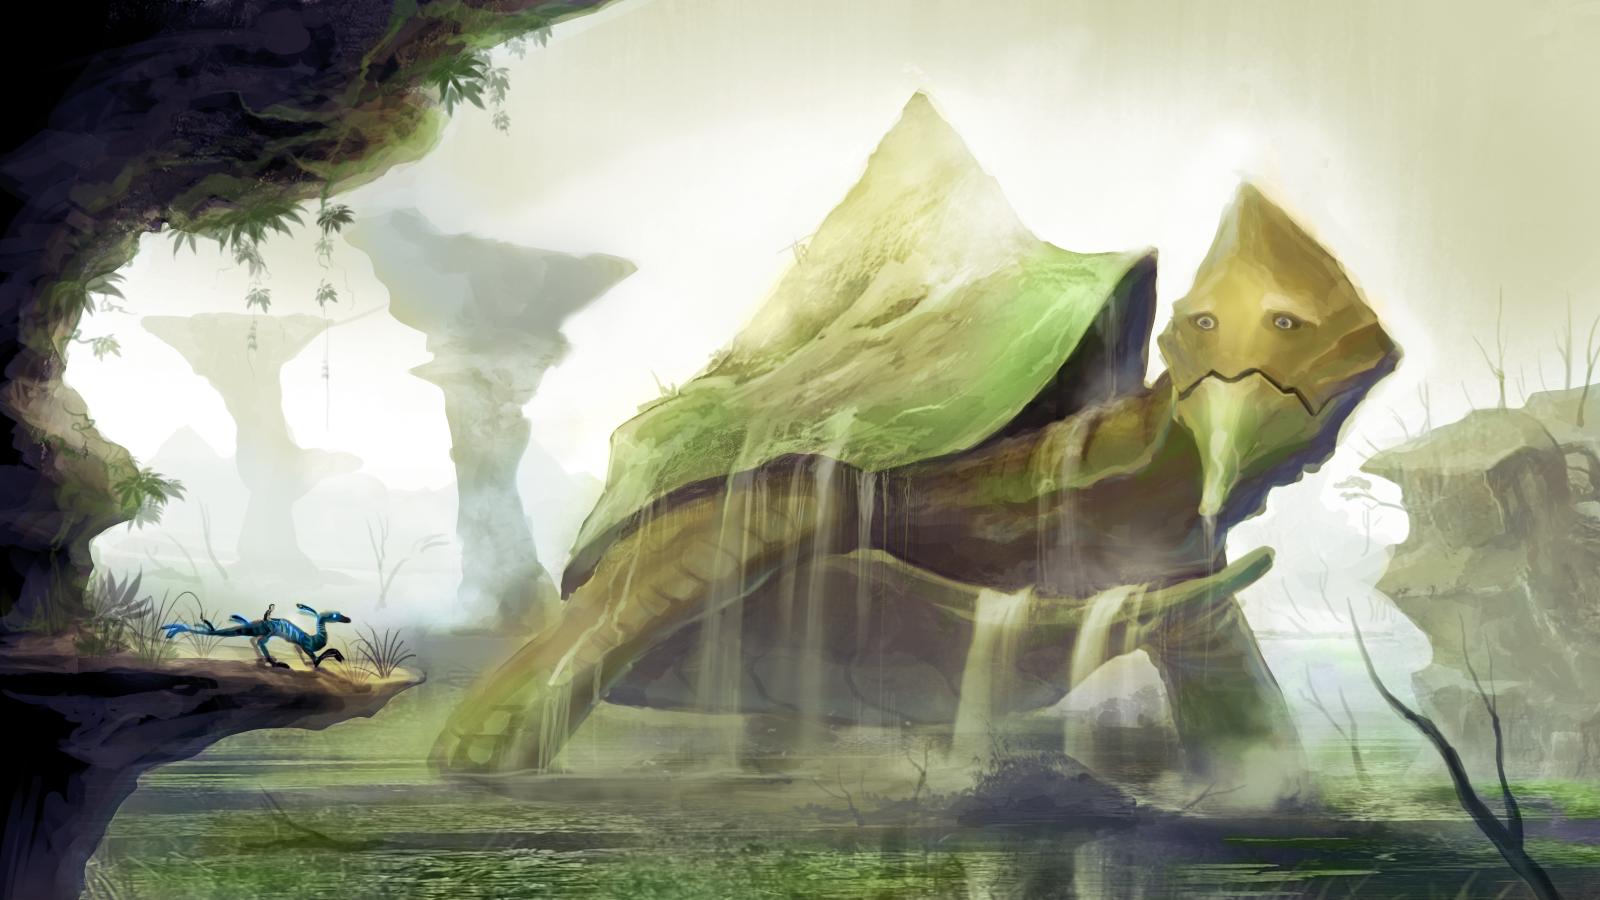 Morla Environment Concept by xvortexbladex on DeviantArt